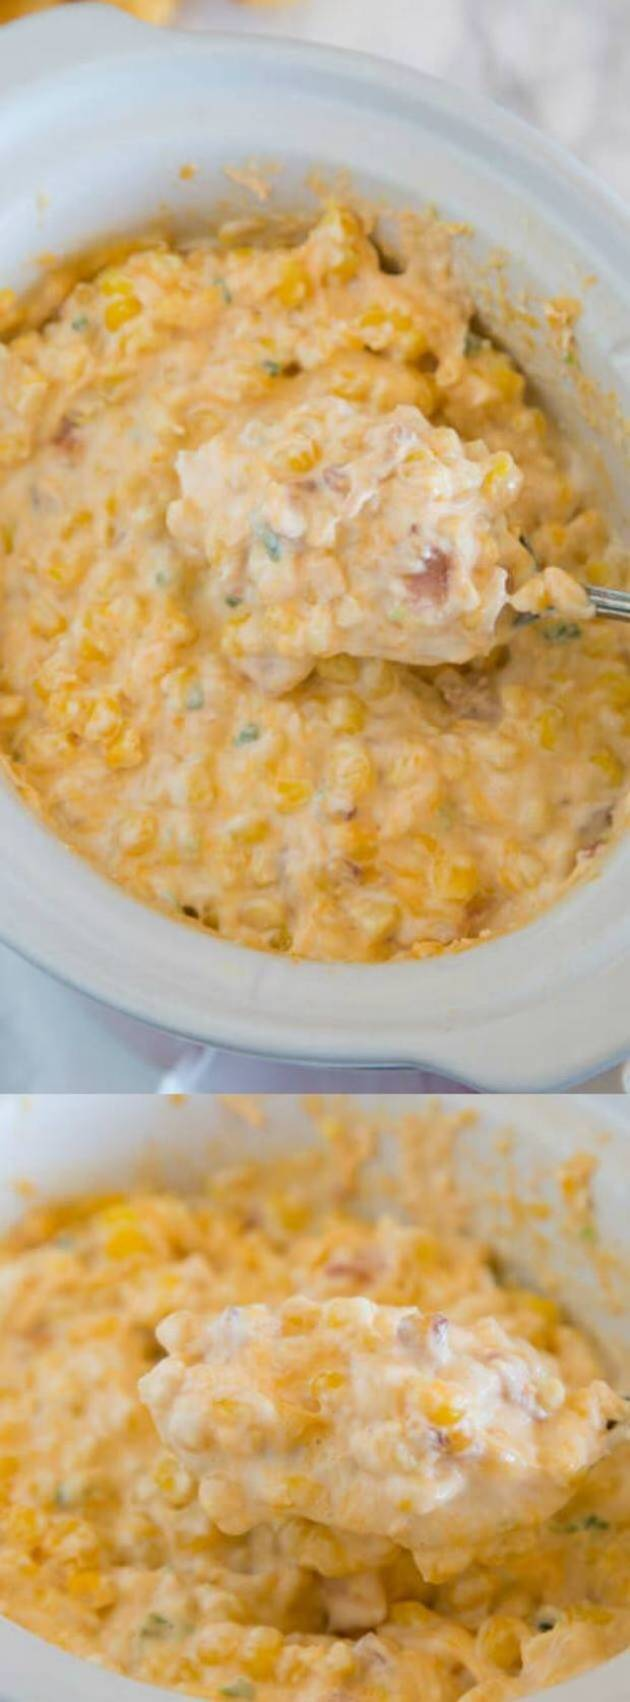 Cheesy Corn Dip Longpin